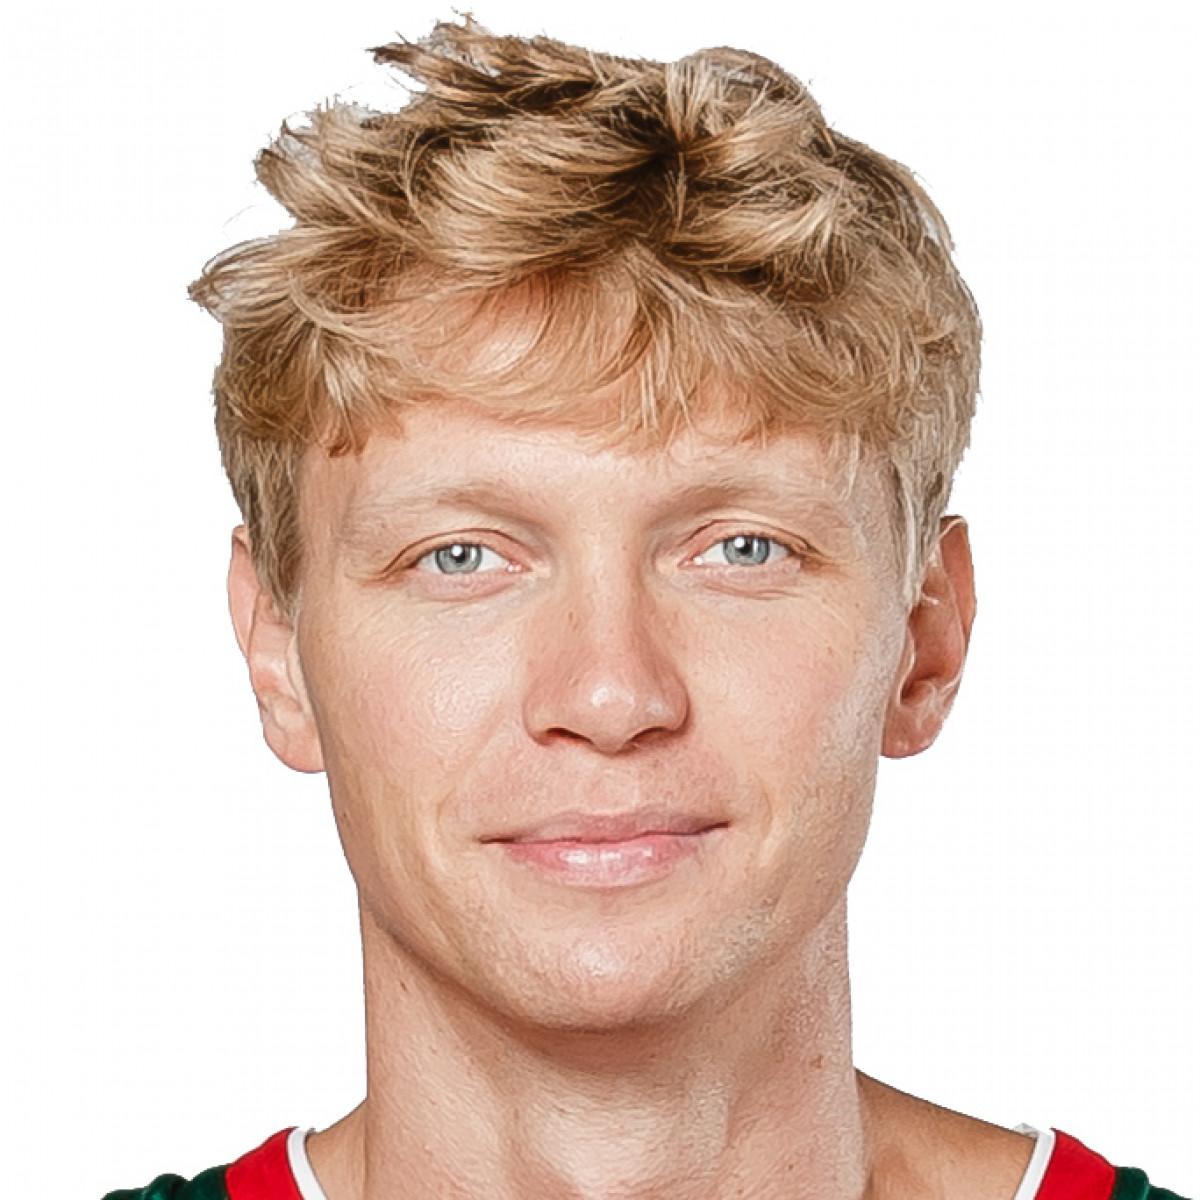 Mindaugas Kuzminskas